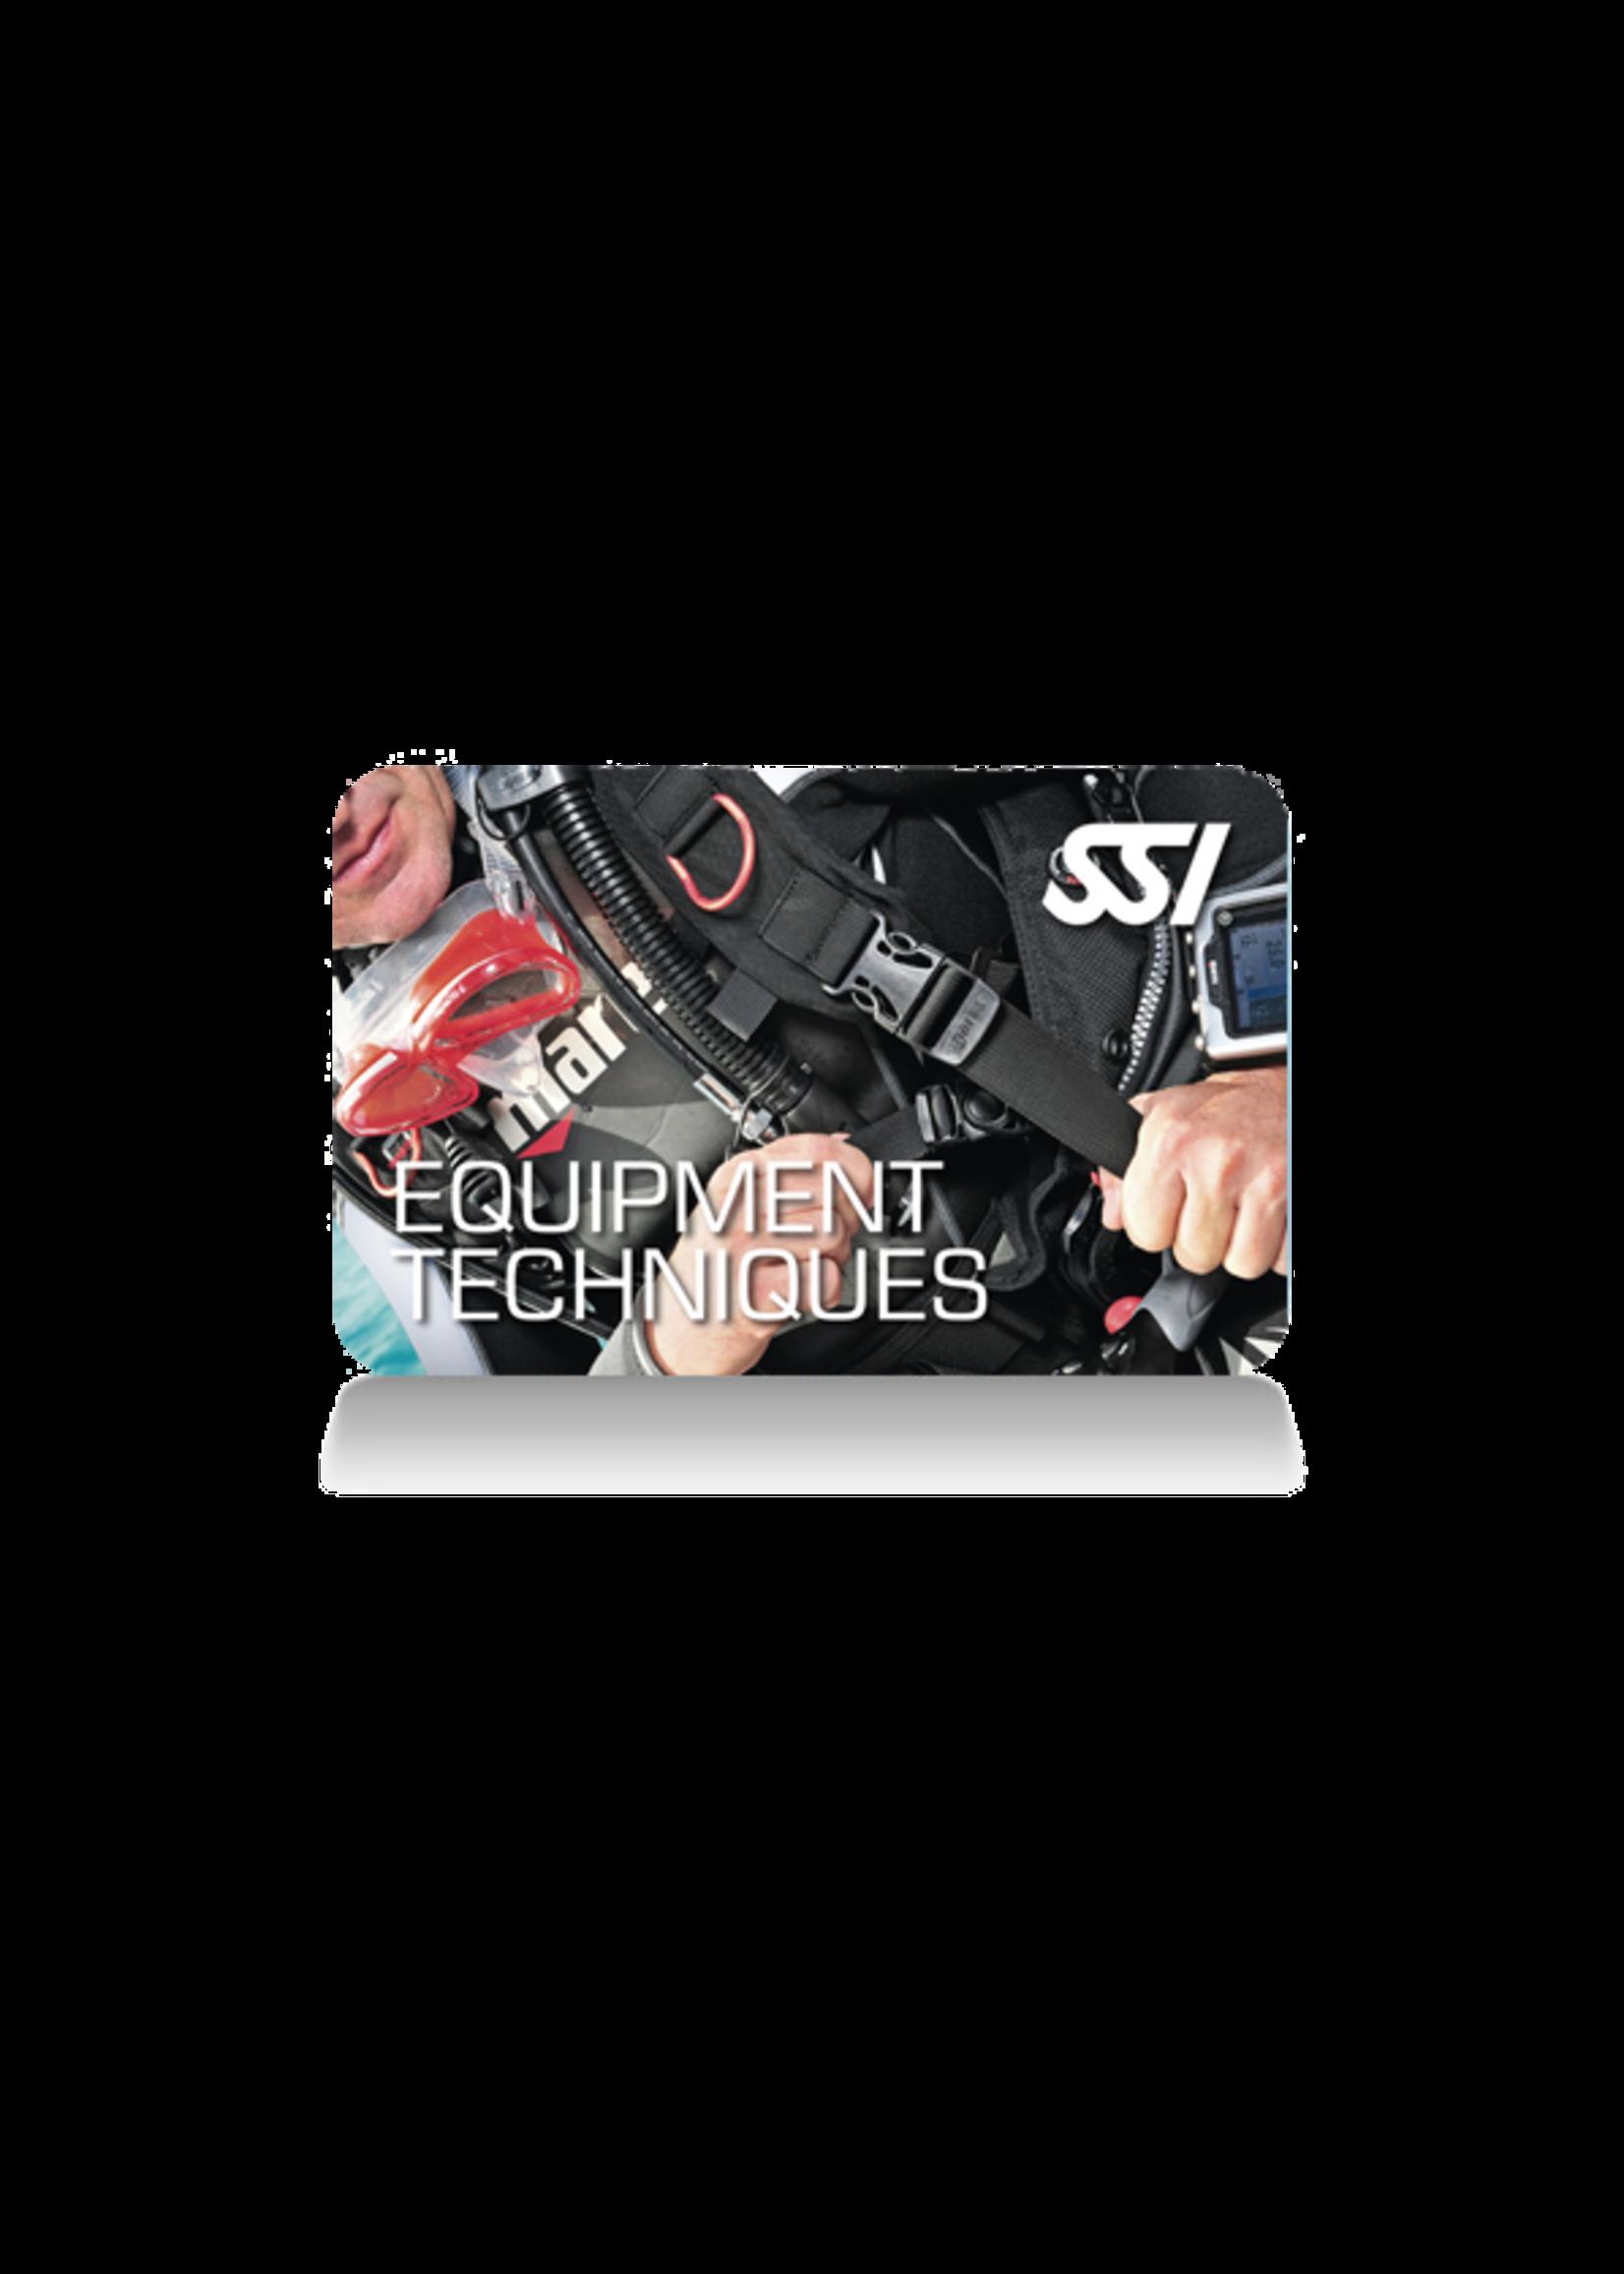 SSI Equipment Techniques Specialty